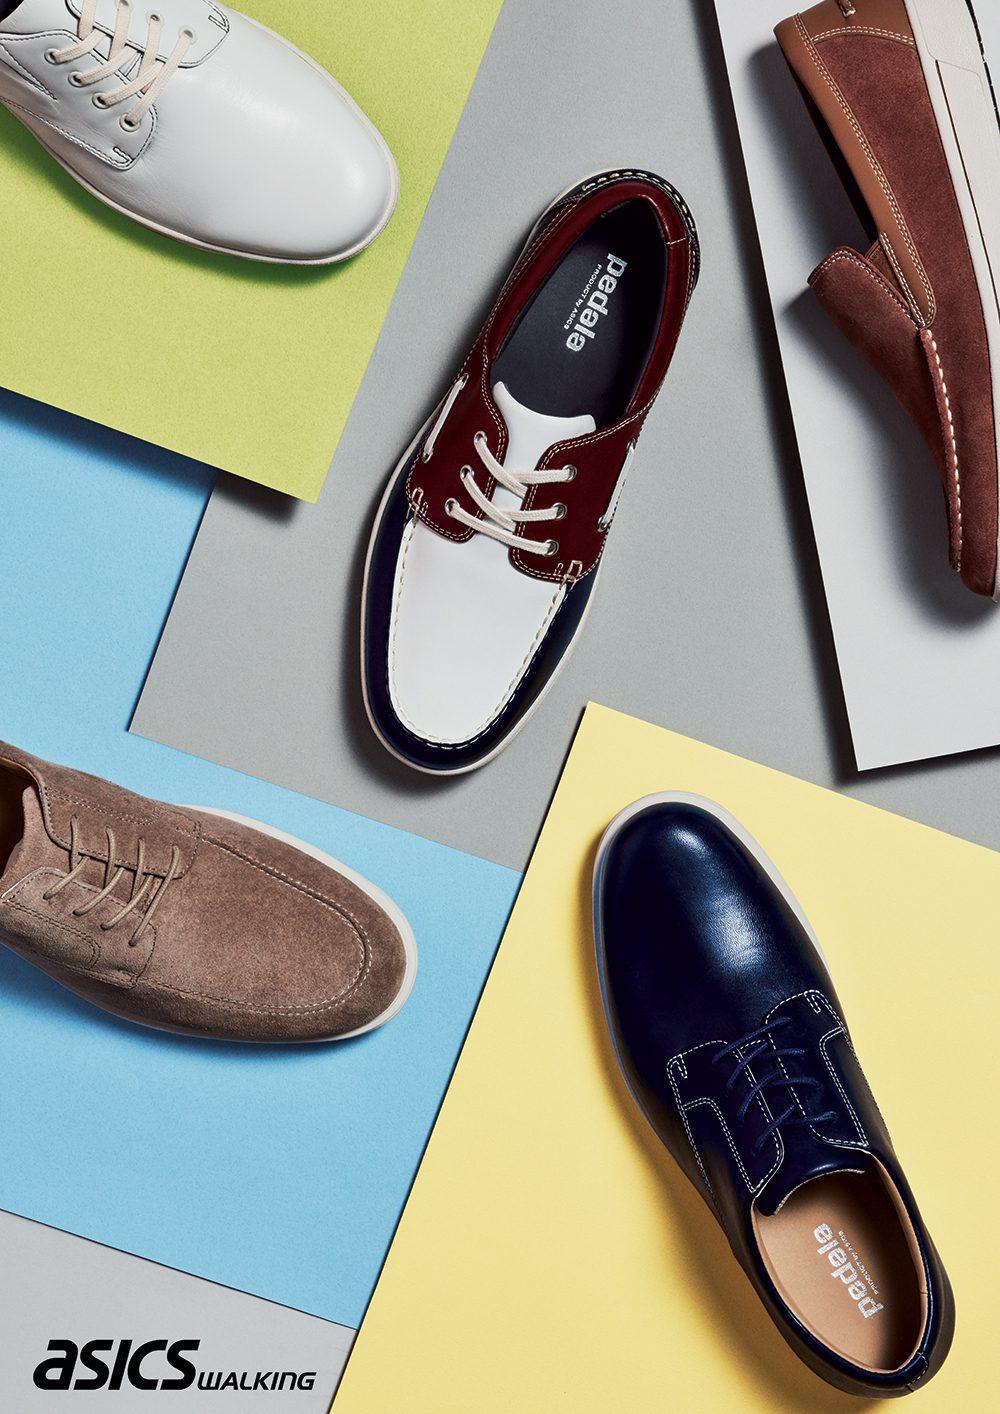 ASICS Walking Shoes PEDALA